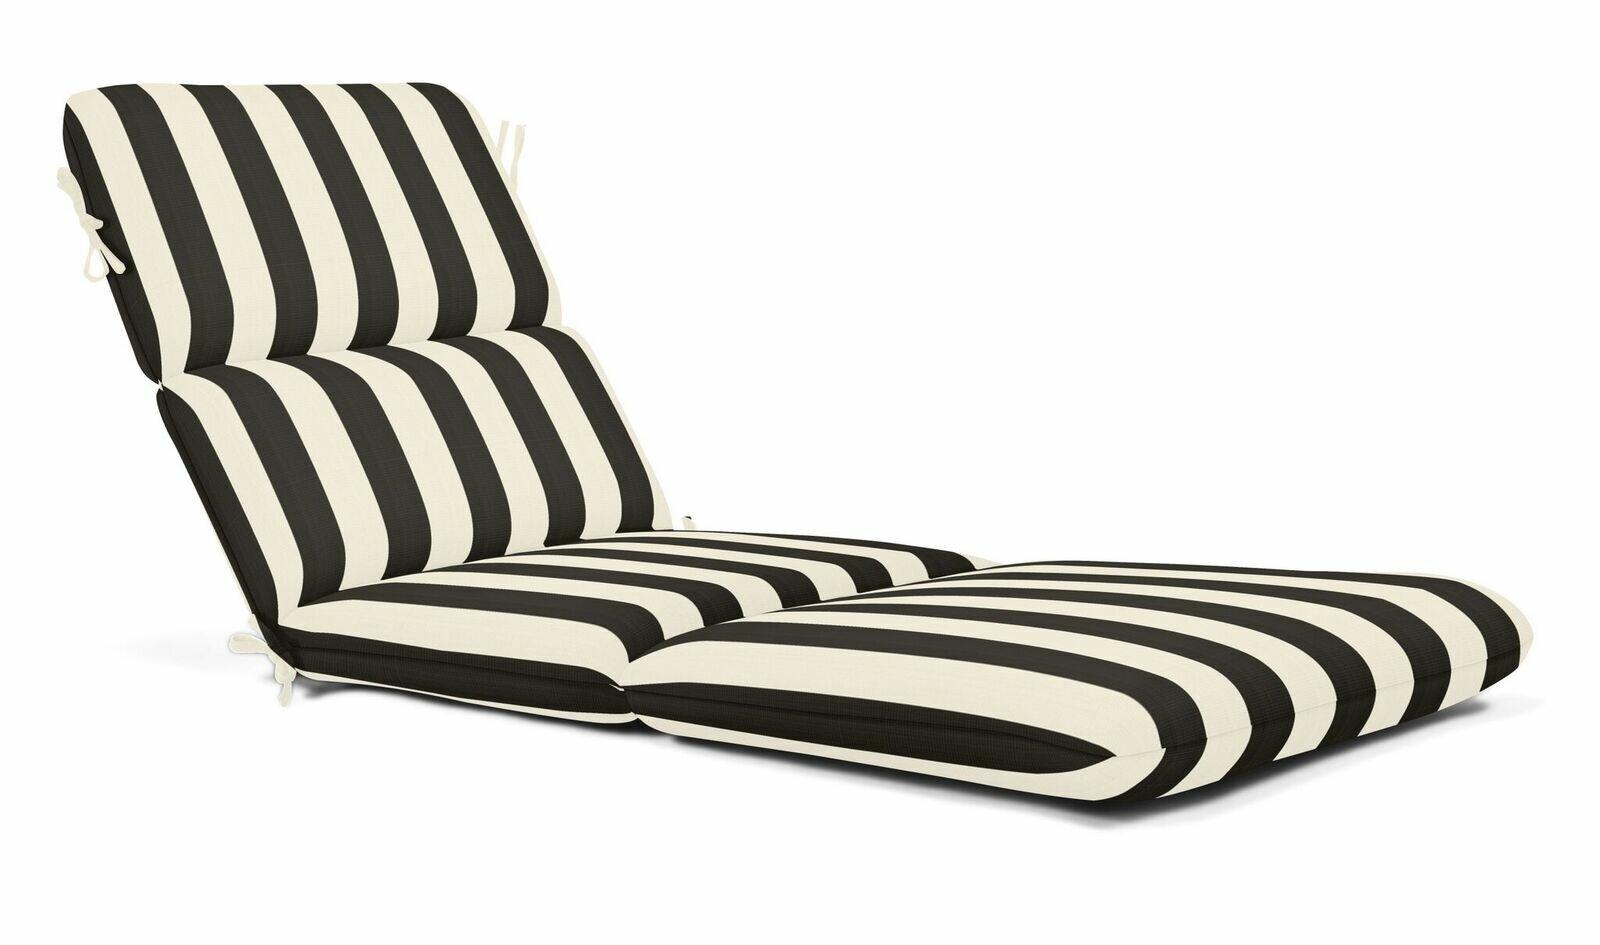 Indoor Outdoor Sunbrella Chaise Lounge Cushion